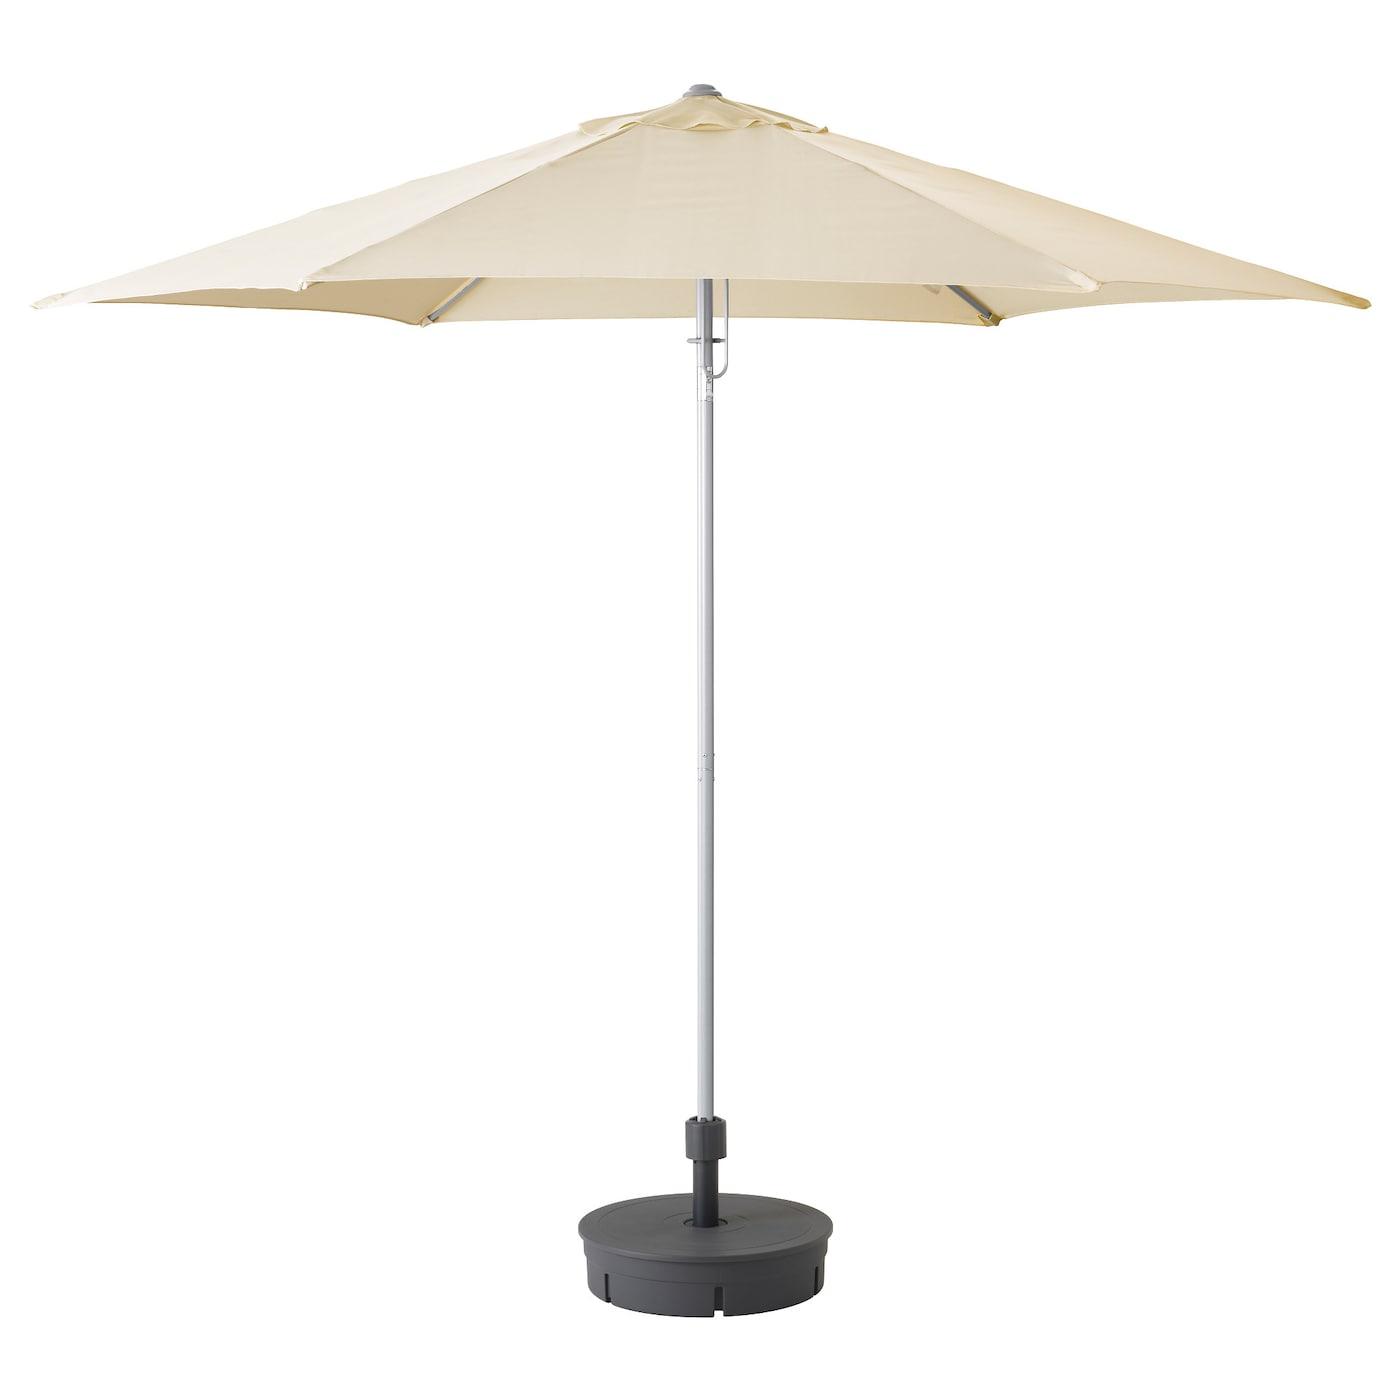 Ikea Schirmständer lökö sonnenschirmfuß ikea